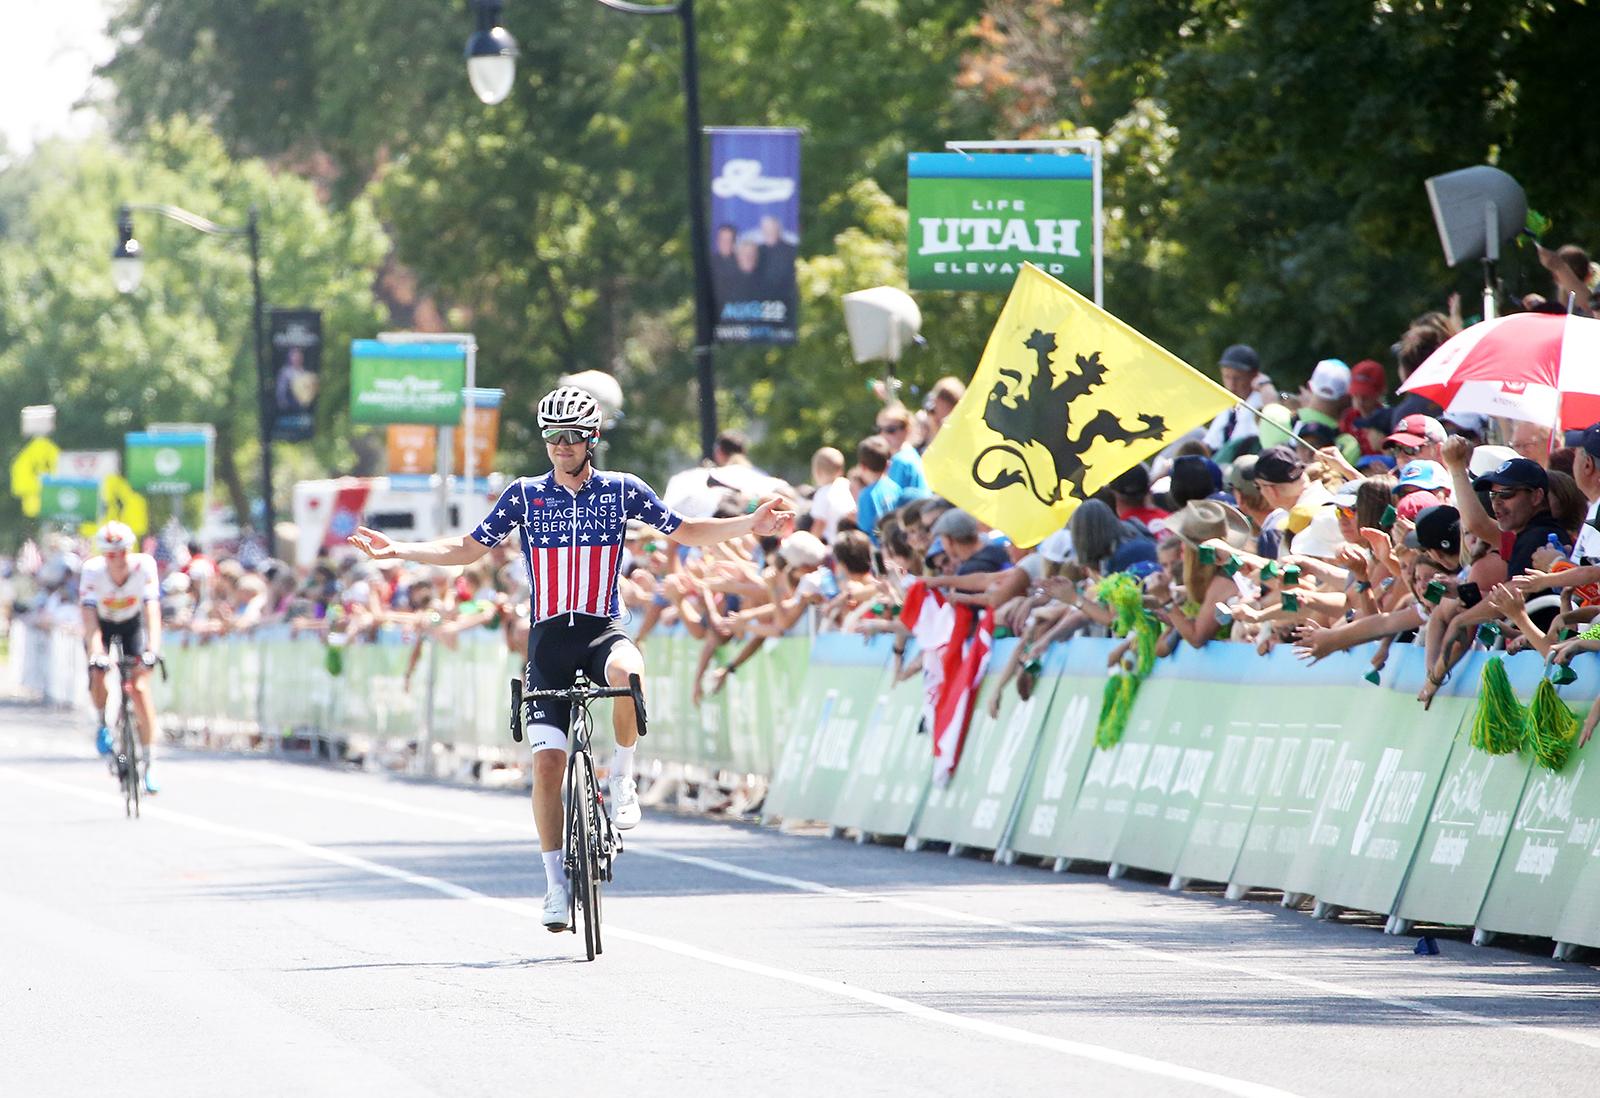 US National Champion, Jonny Brown (Hagens Berman Axeon). 2018 Tour of Utah Stage 3, August 8, 2018, Layton, Utah. Photo by Cathy Fegan-Kim, cottonsoxphotography.net